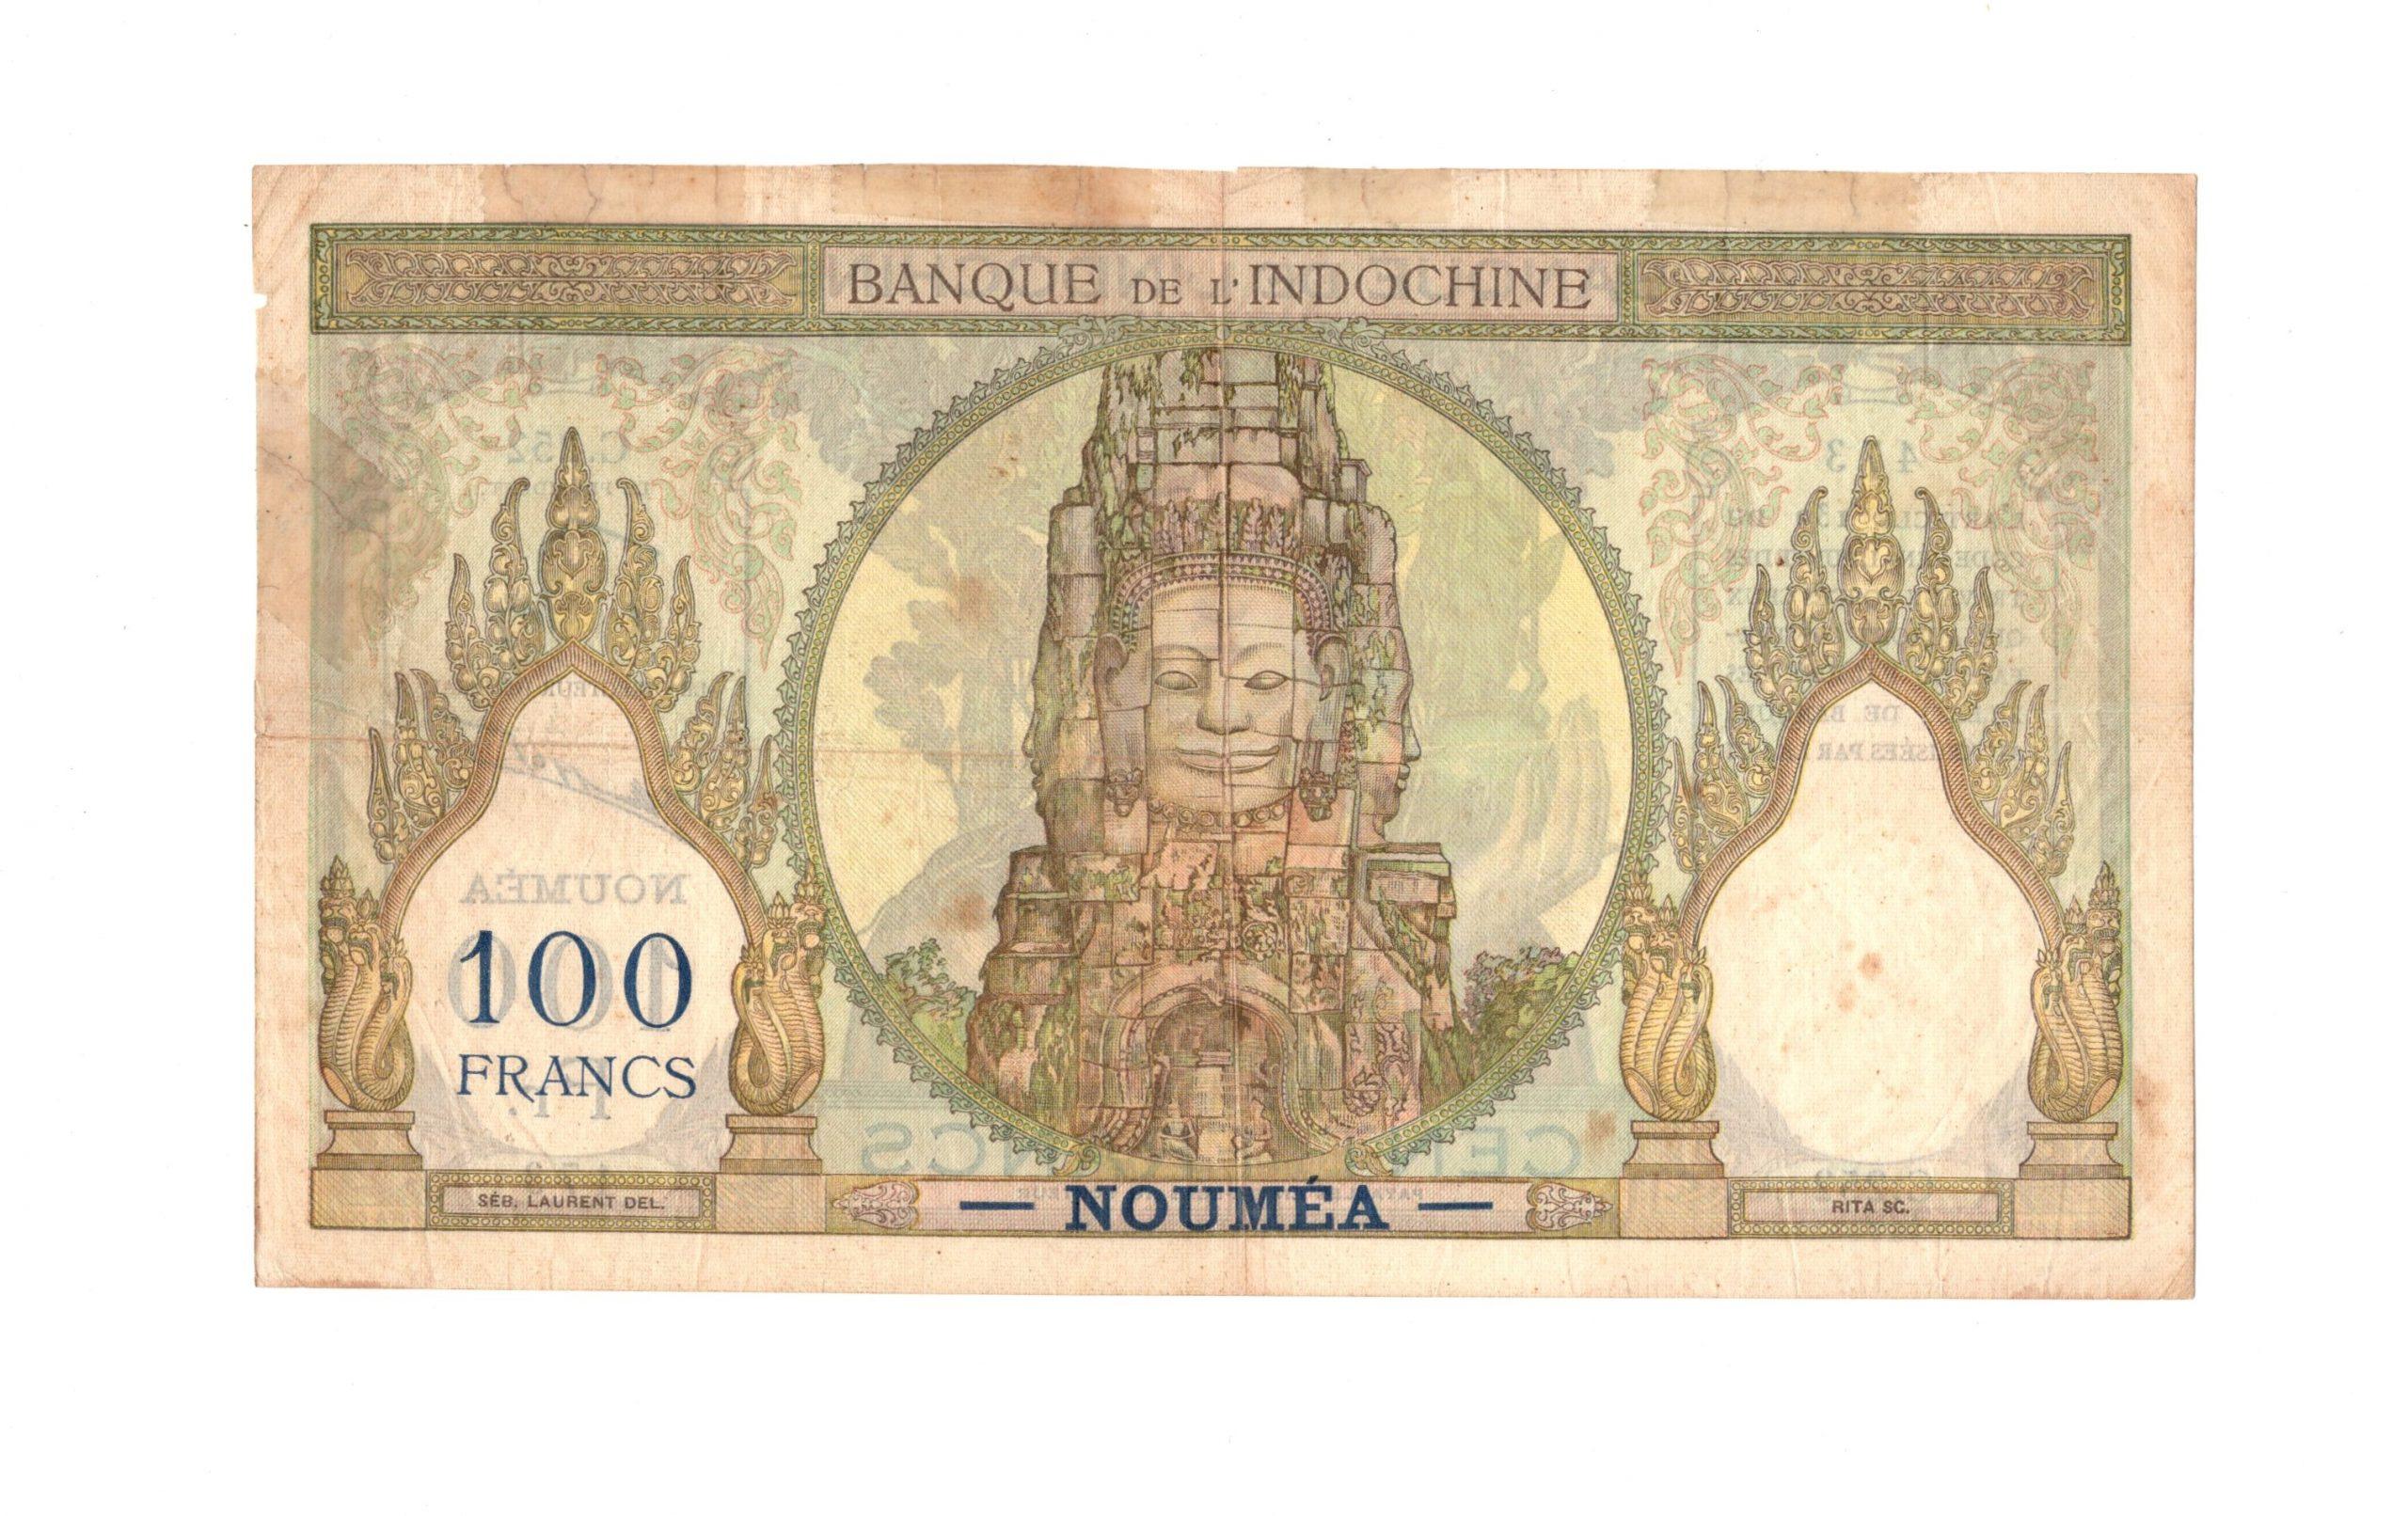 french idnochina 100 francs